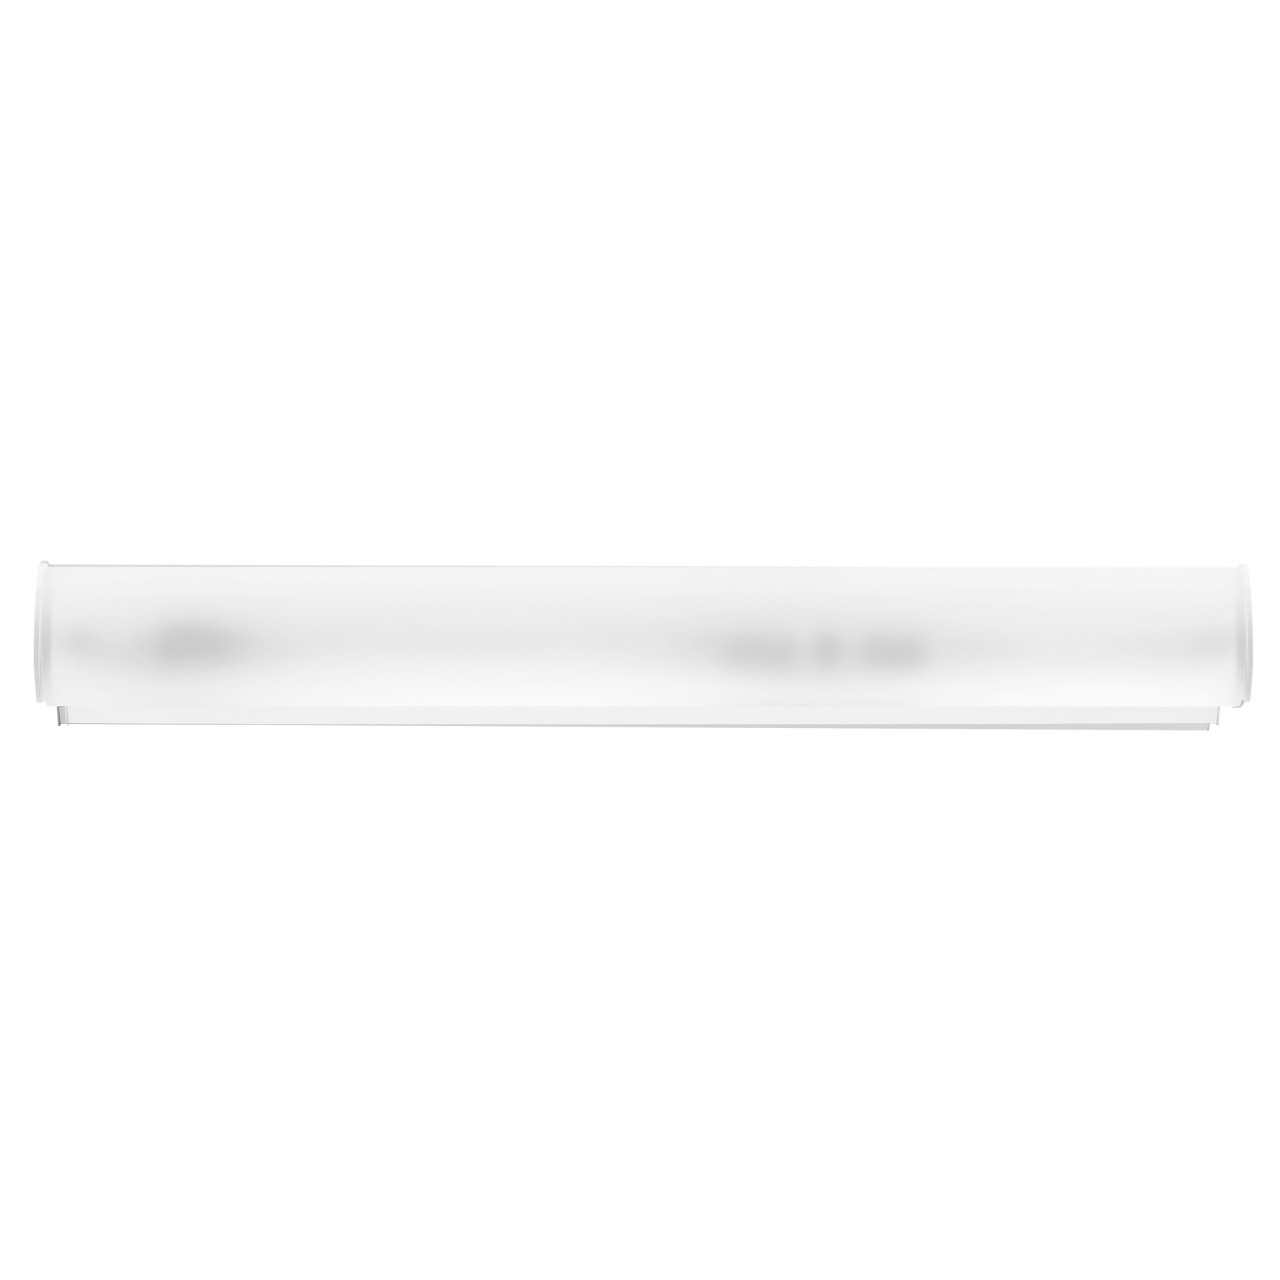 Светильник настенный Blanda 3х40W E14 белый Lightstar 801836